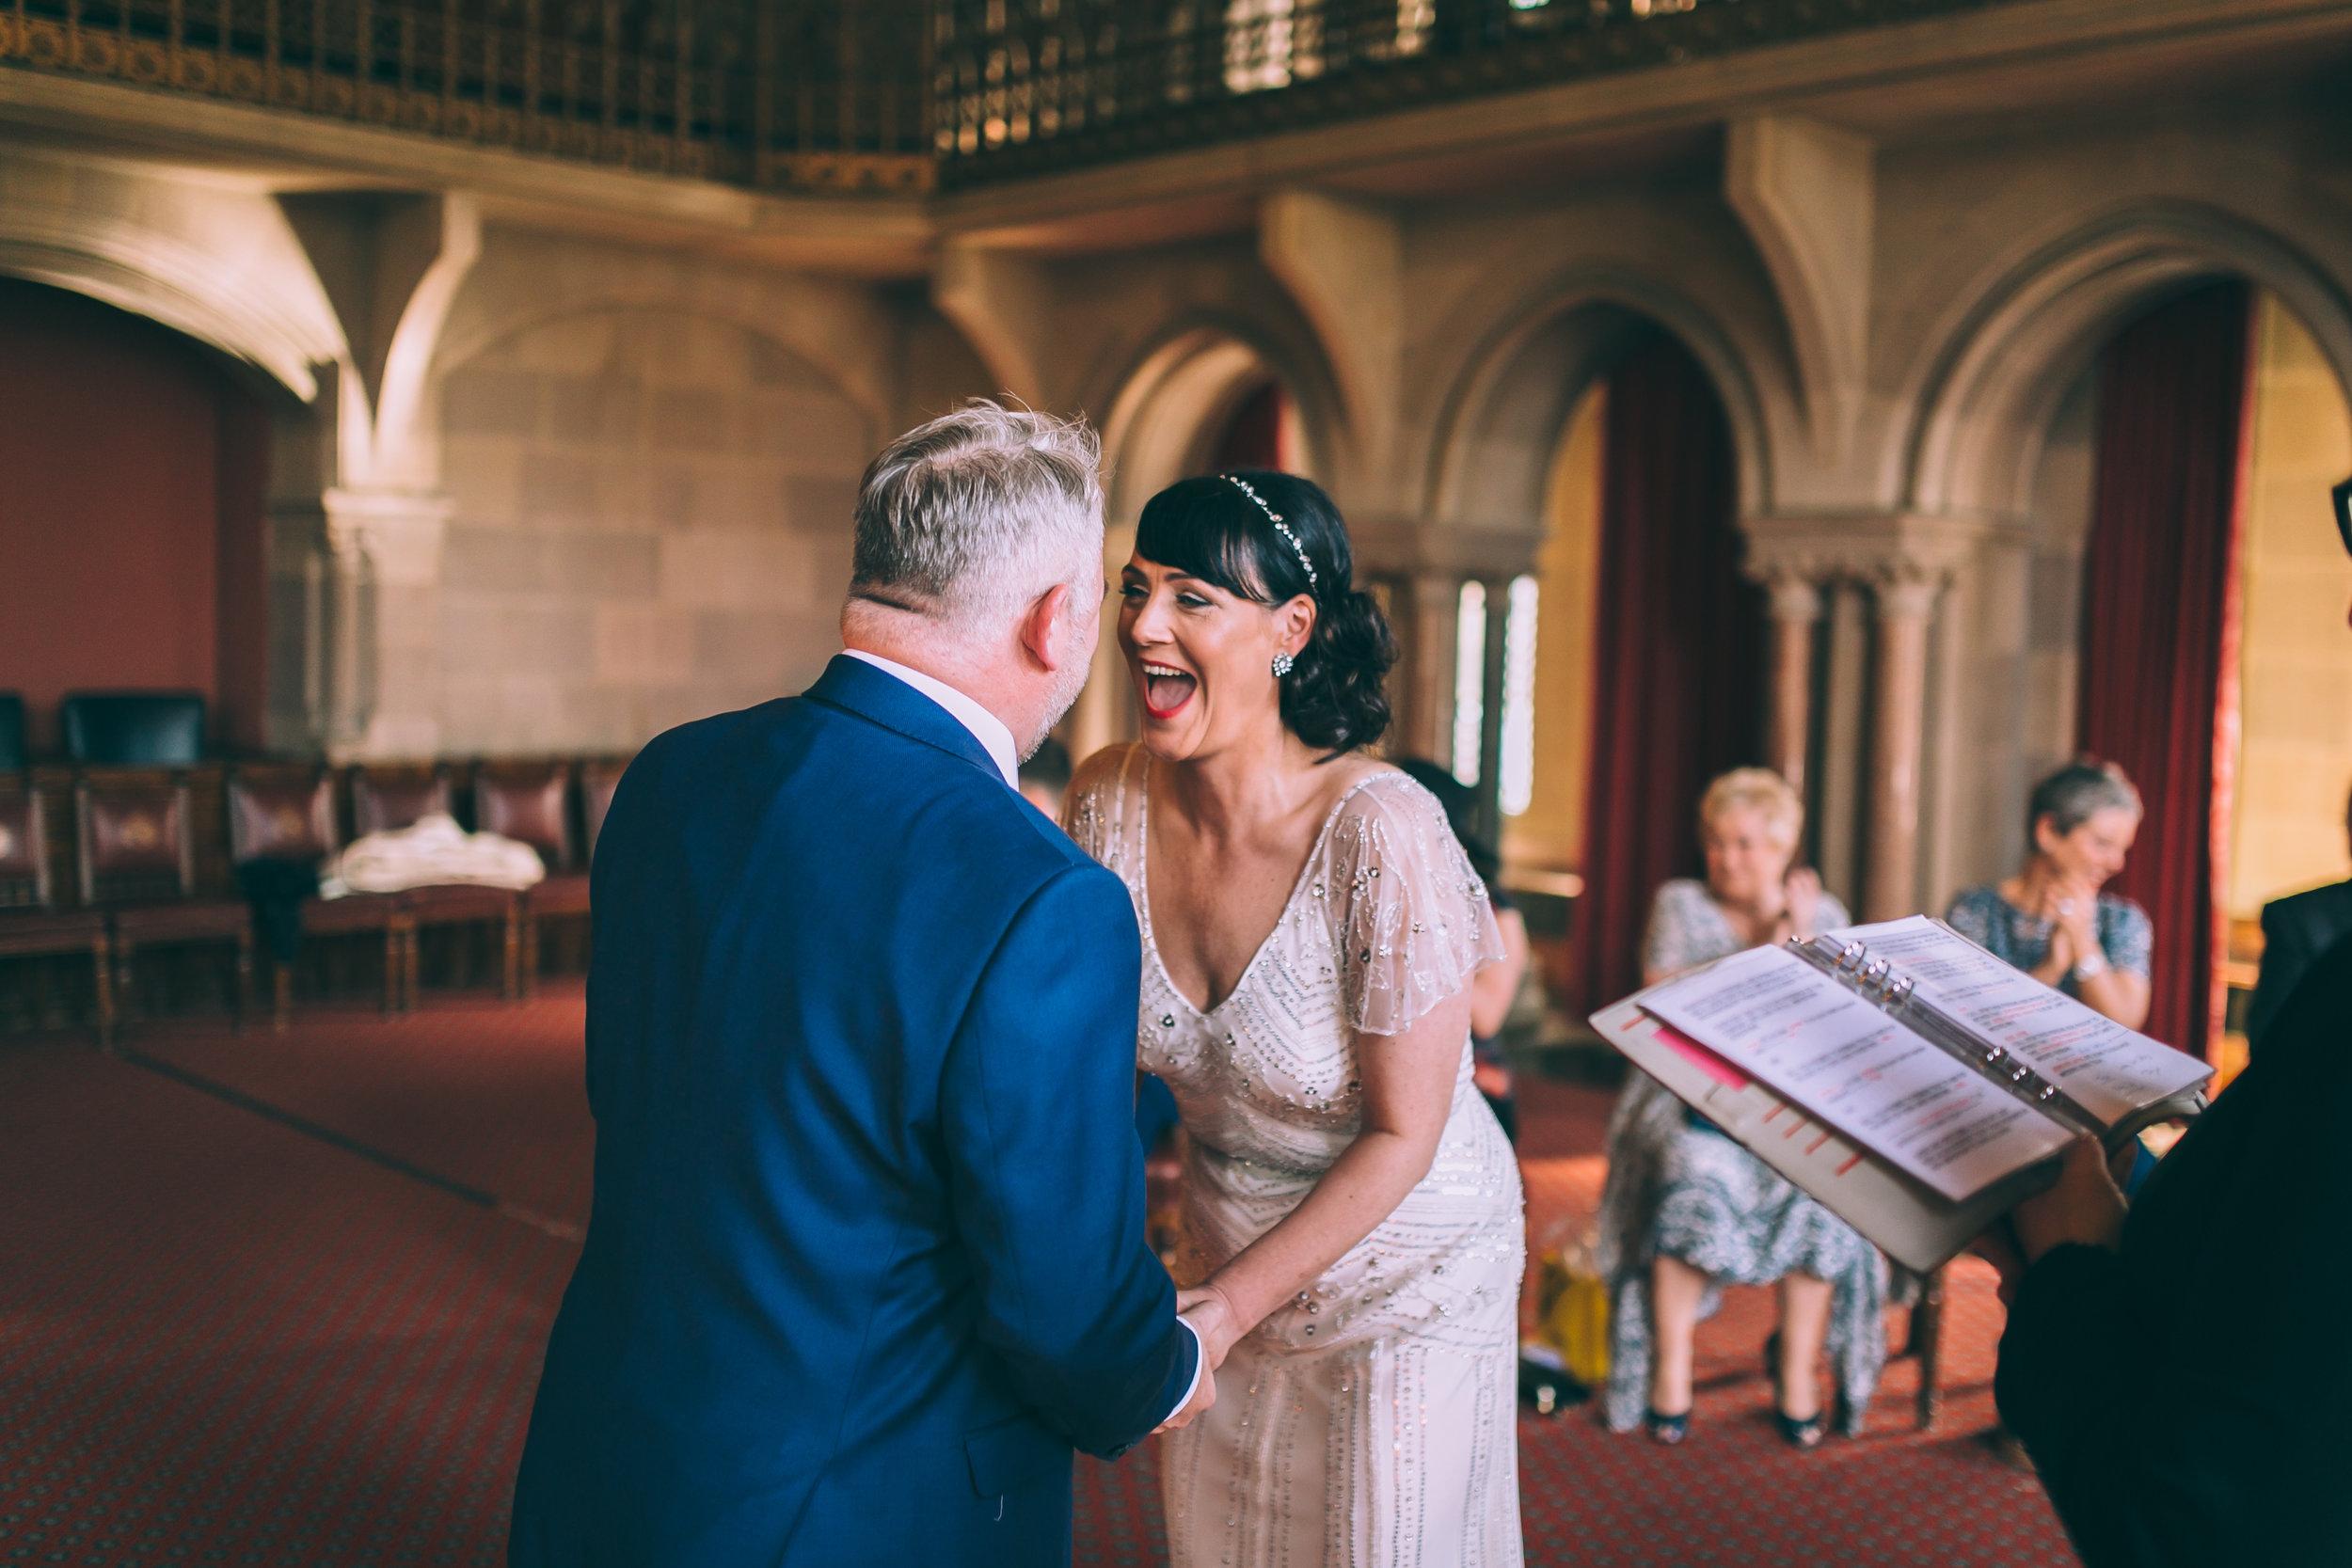 JayneandJohn-Wedding-at-Manchester-town-hall-manchetser-house-tom-biddle-tb104.jpg